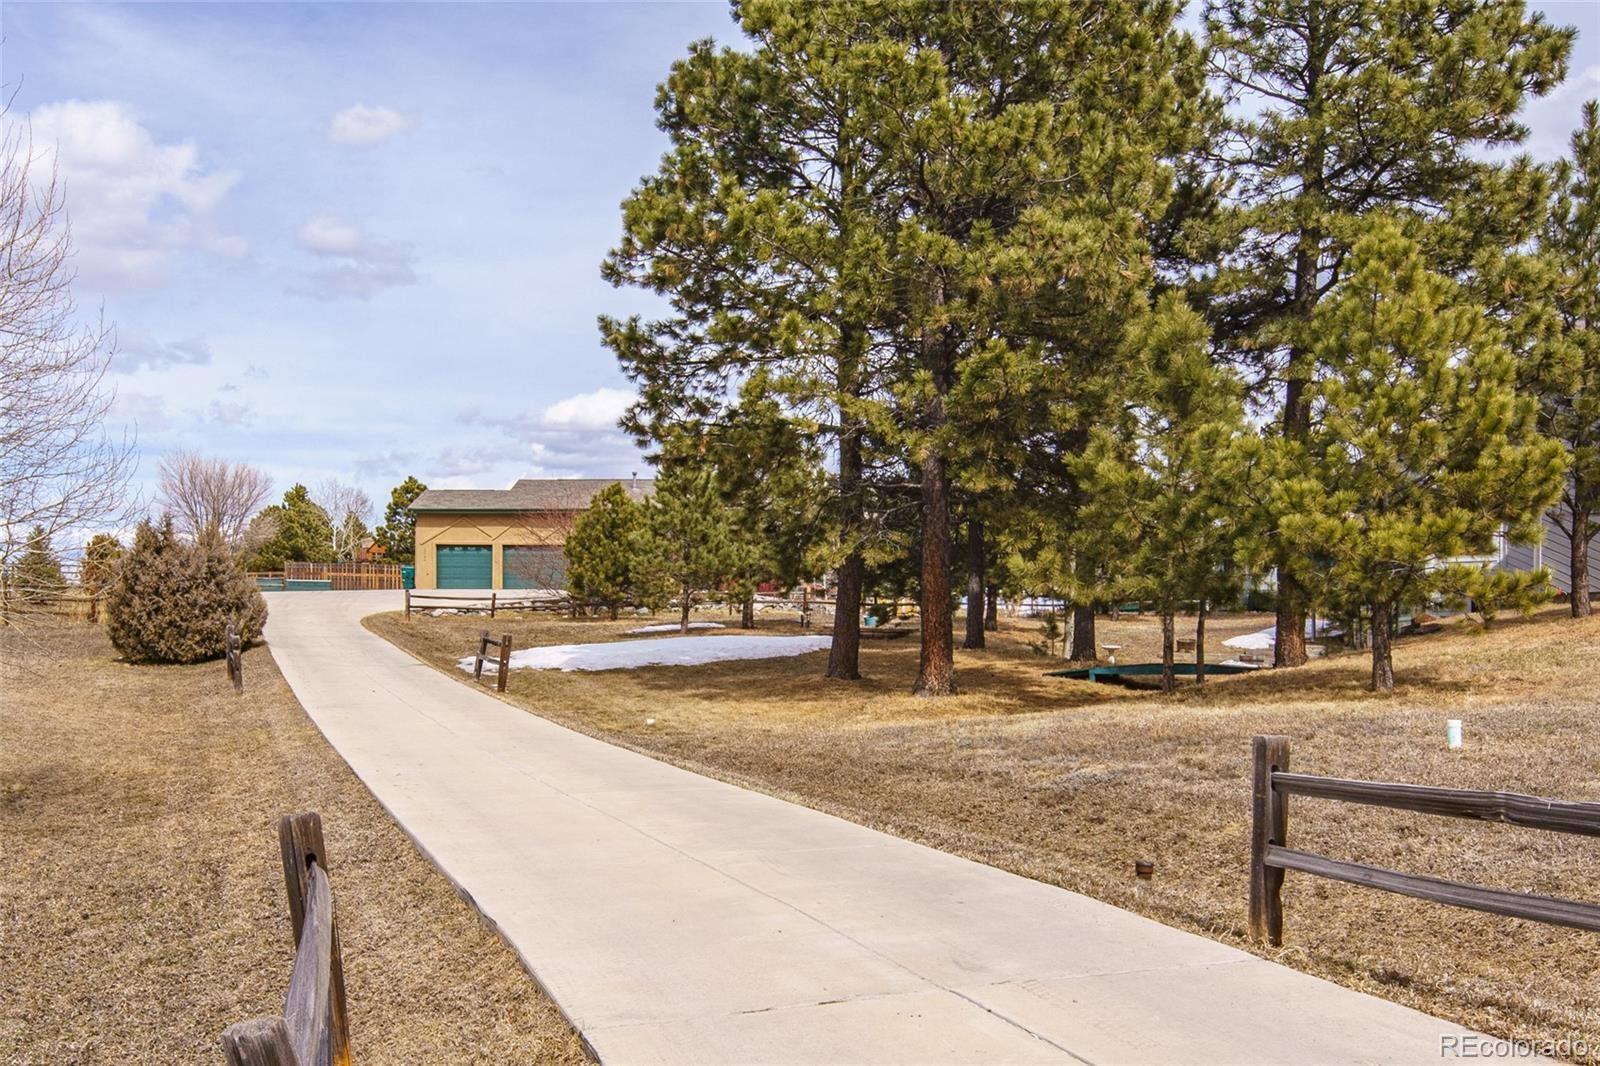 MLS# 9205685 - 4 - 17720 Pioneer Crossing, Colorado Springs, CO 80908